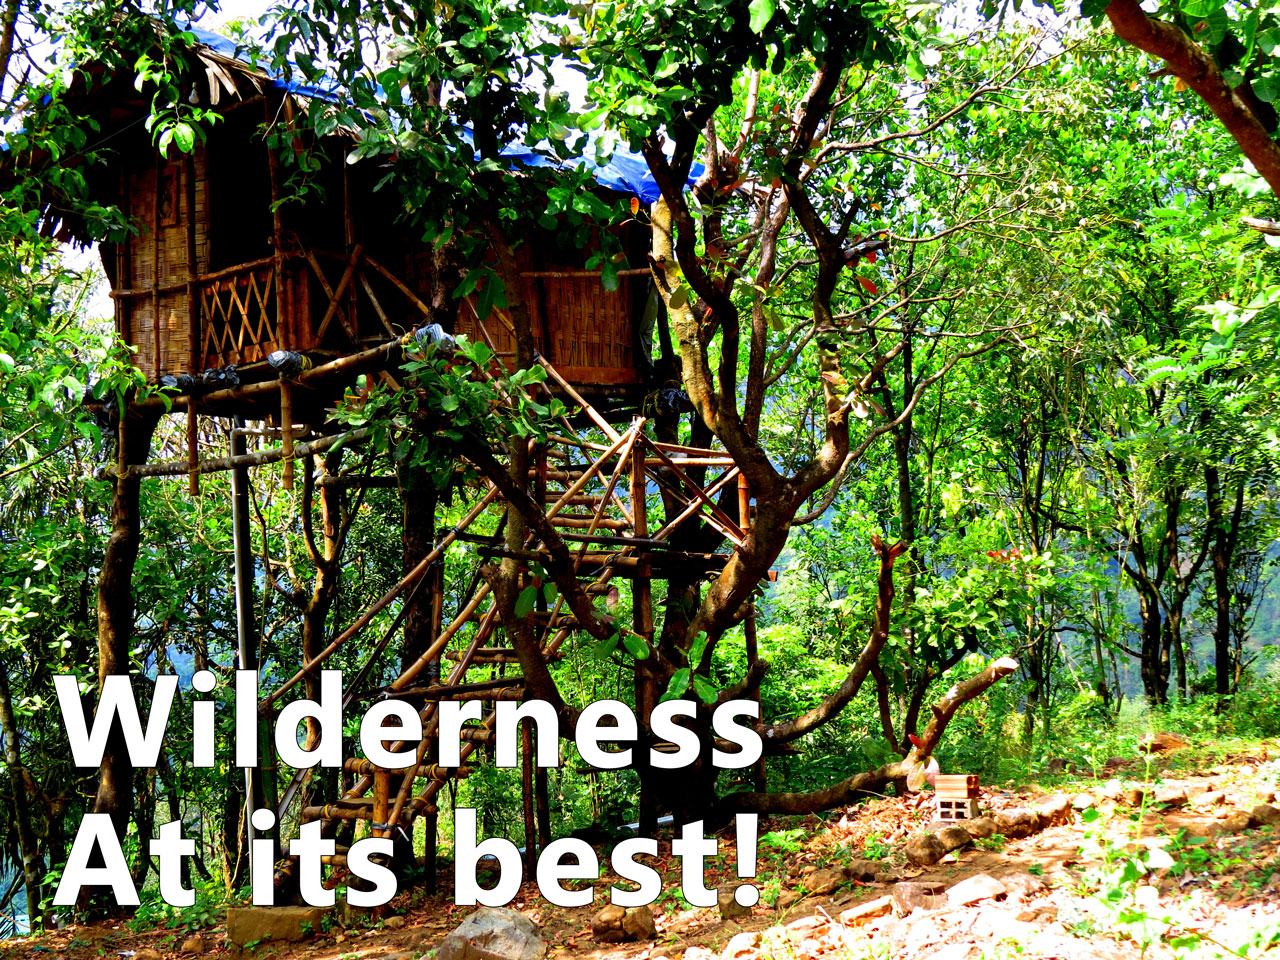 Wilderness at its best at ReginaSilva